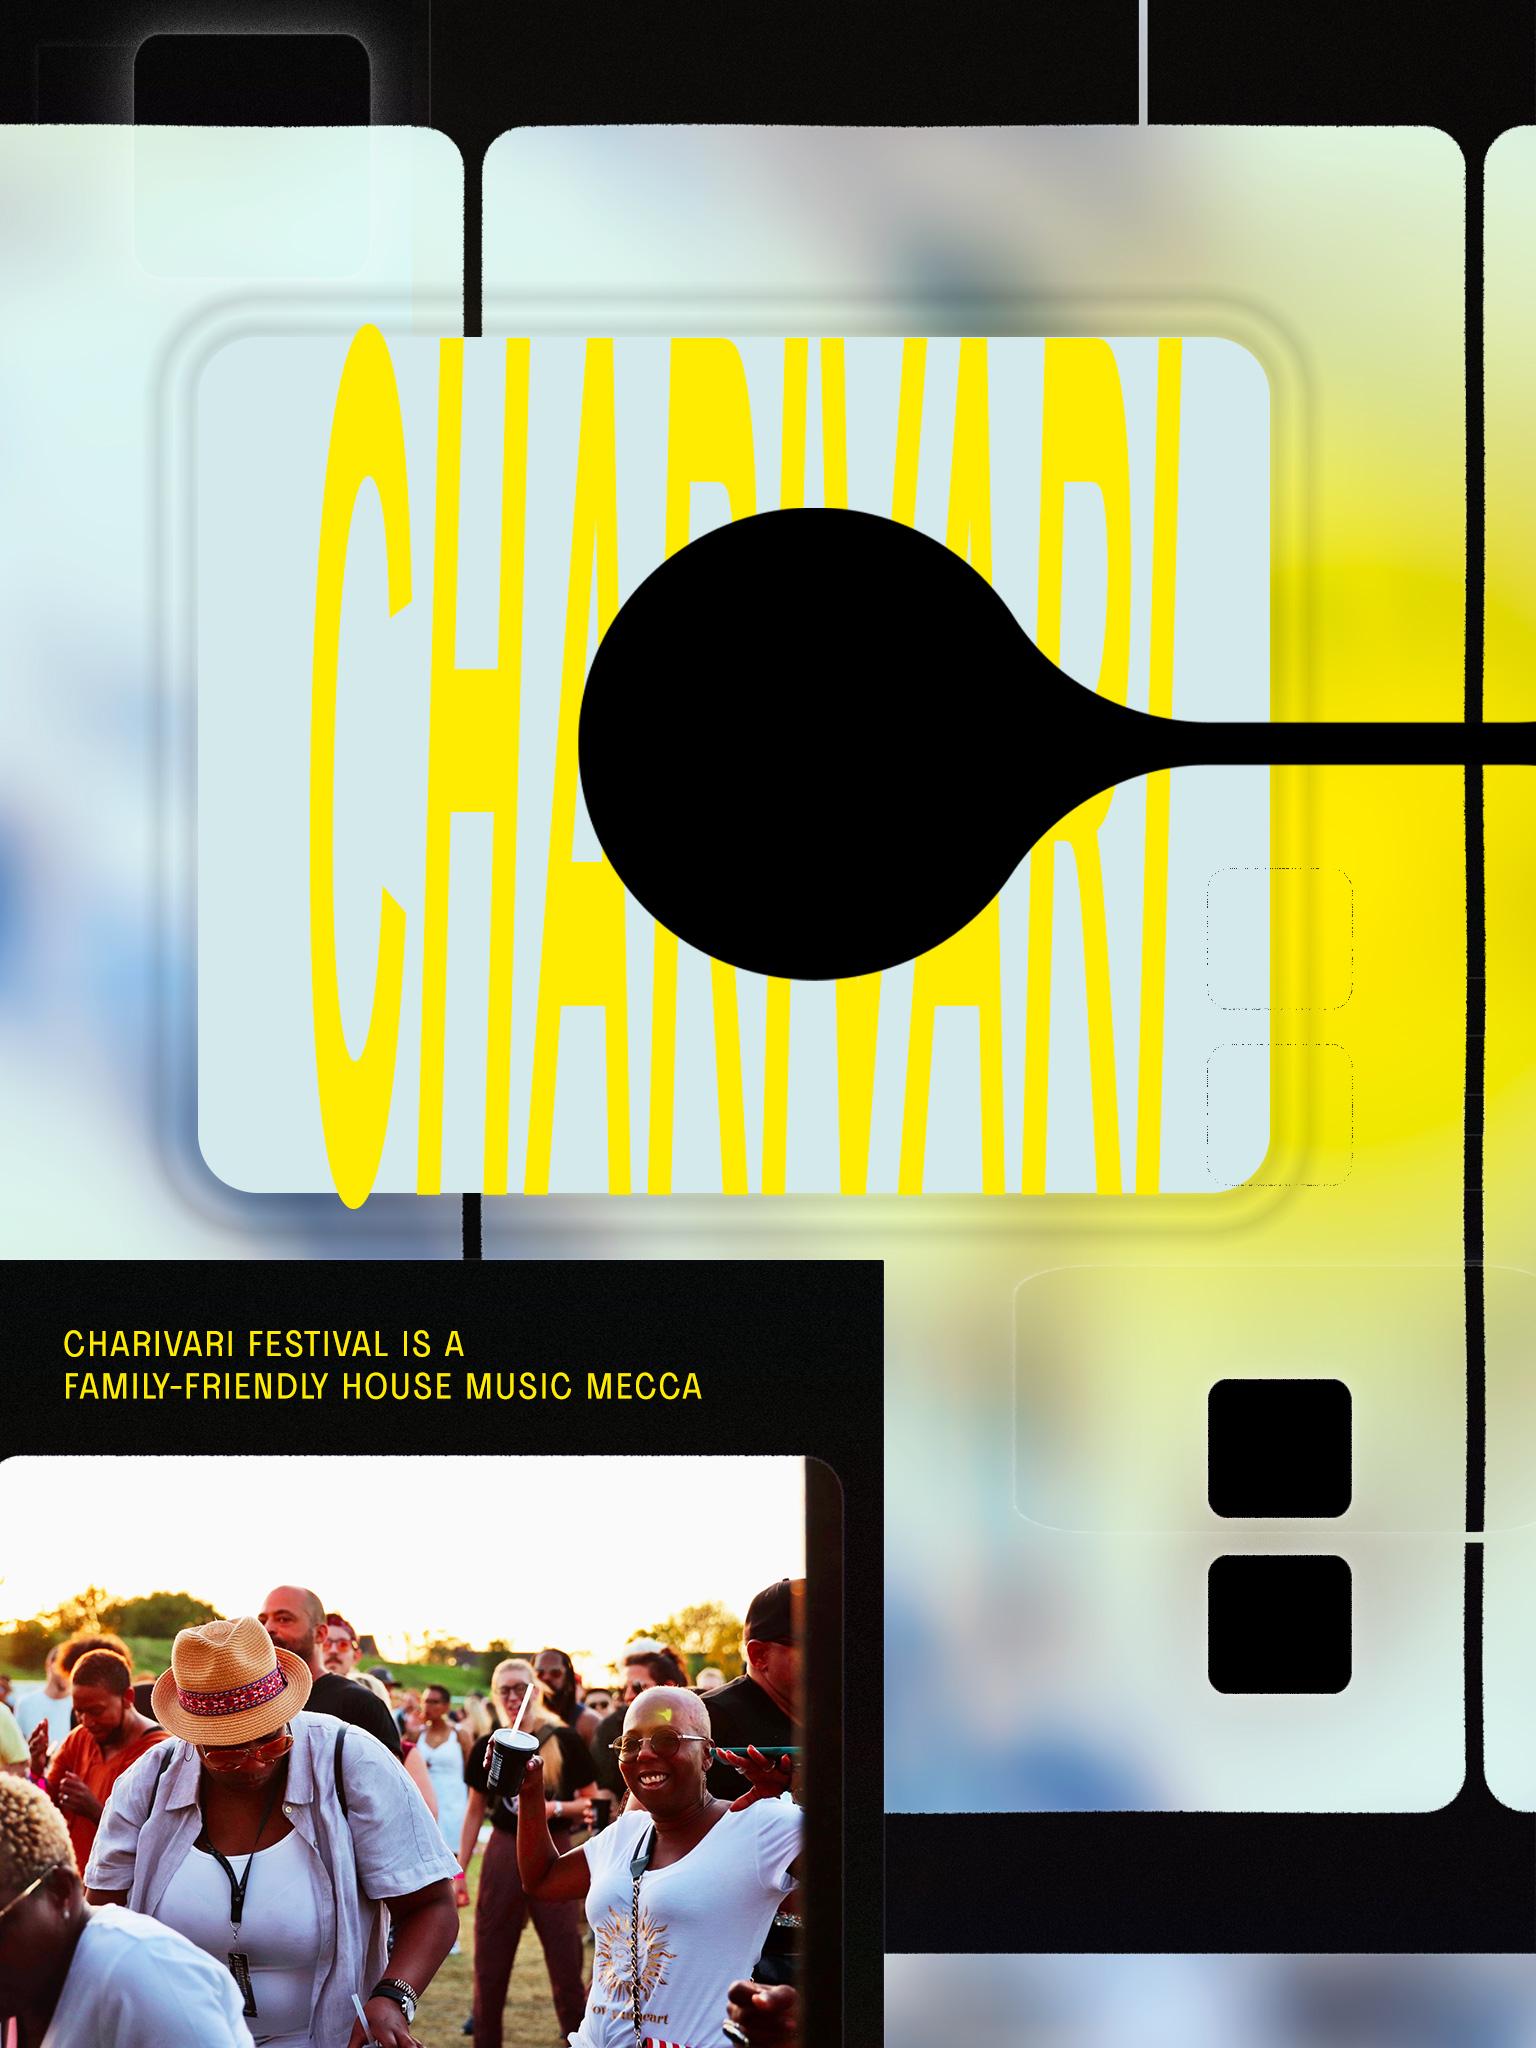 Charivari Festival Is a Family-Friendly House Music Mecca